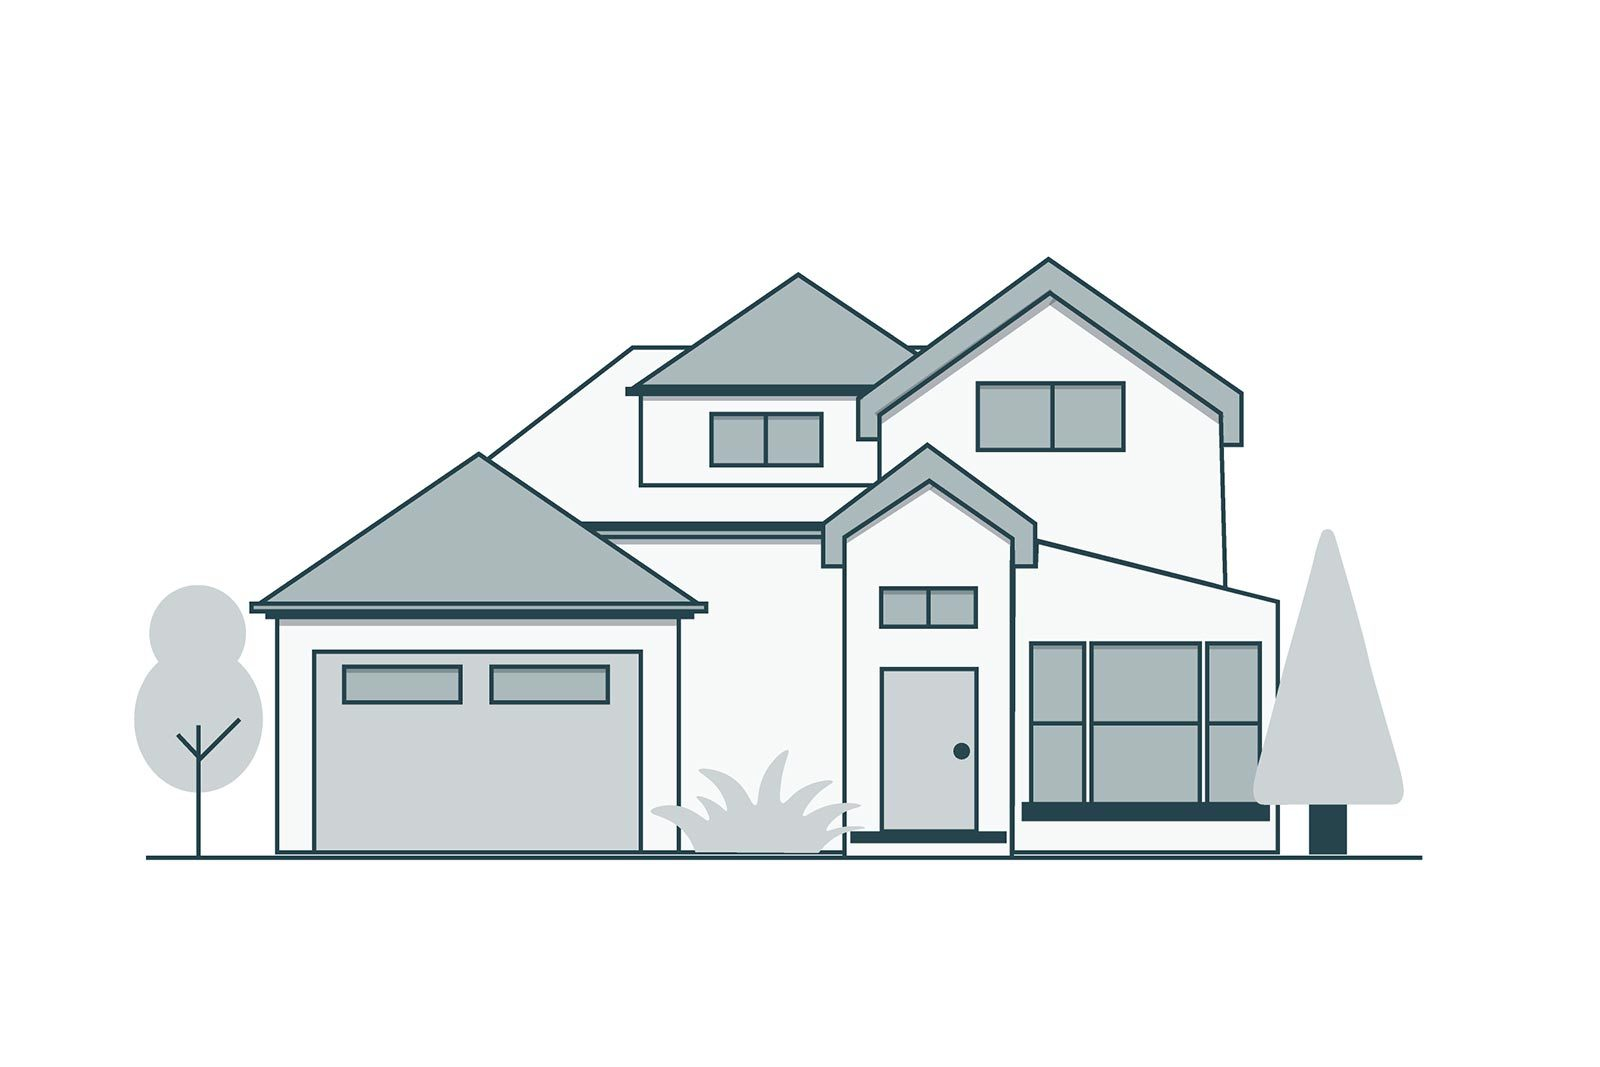 858 Ames Ave Palo Alto, CA 94303